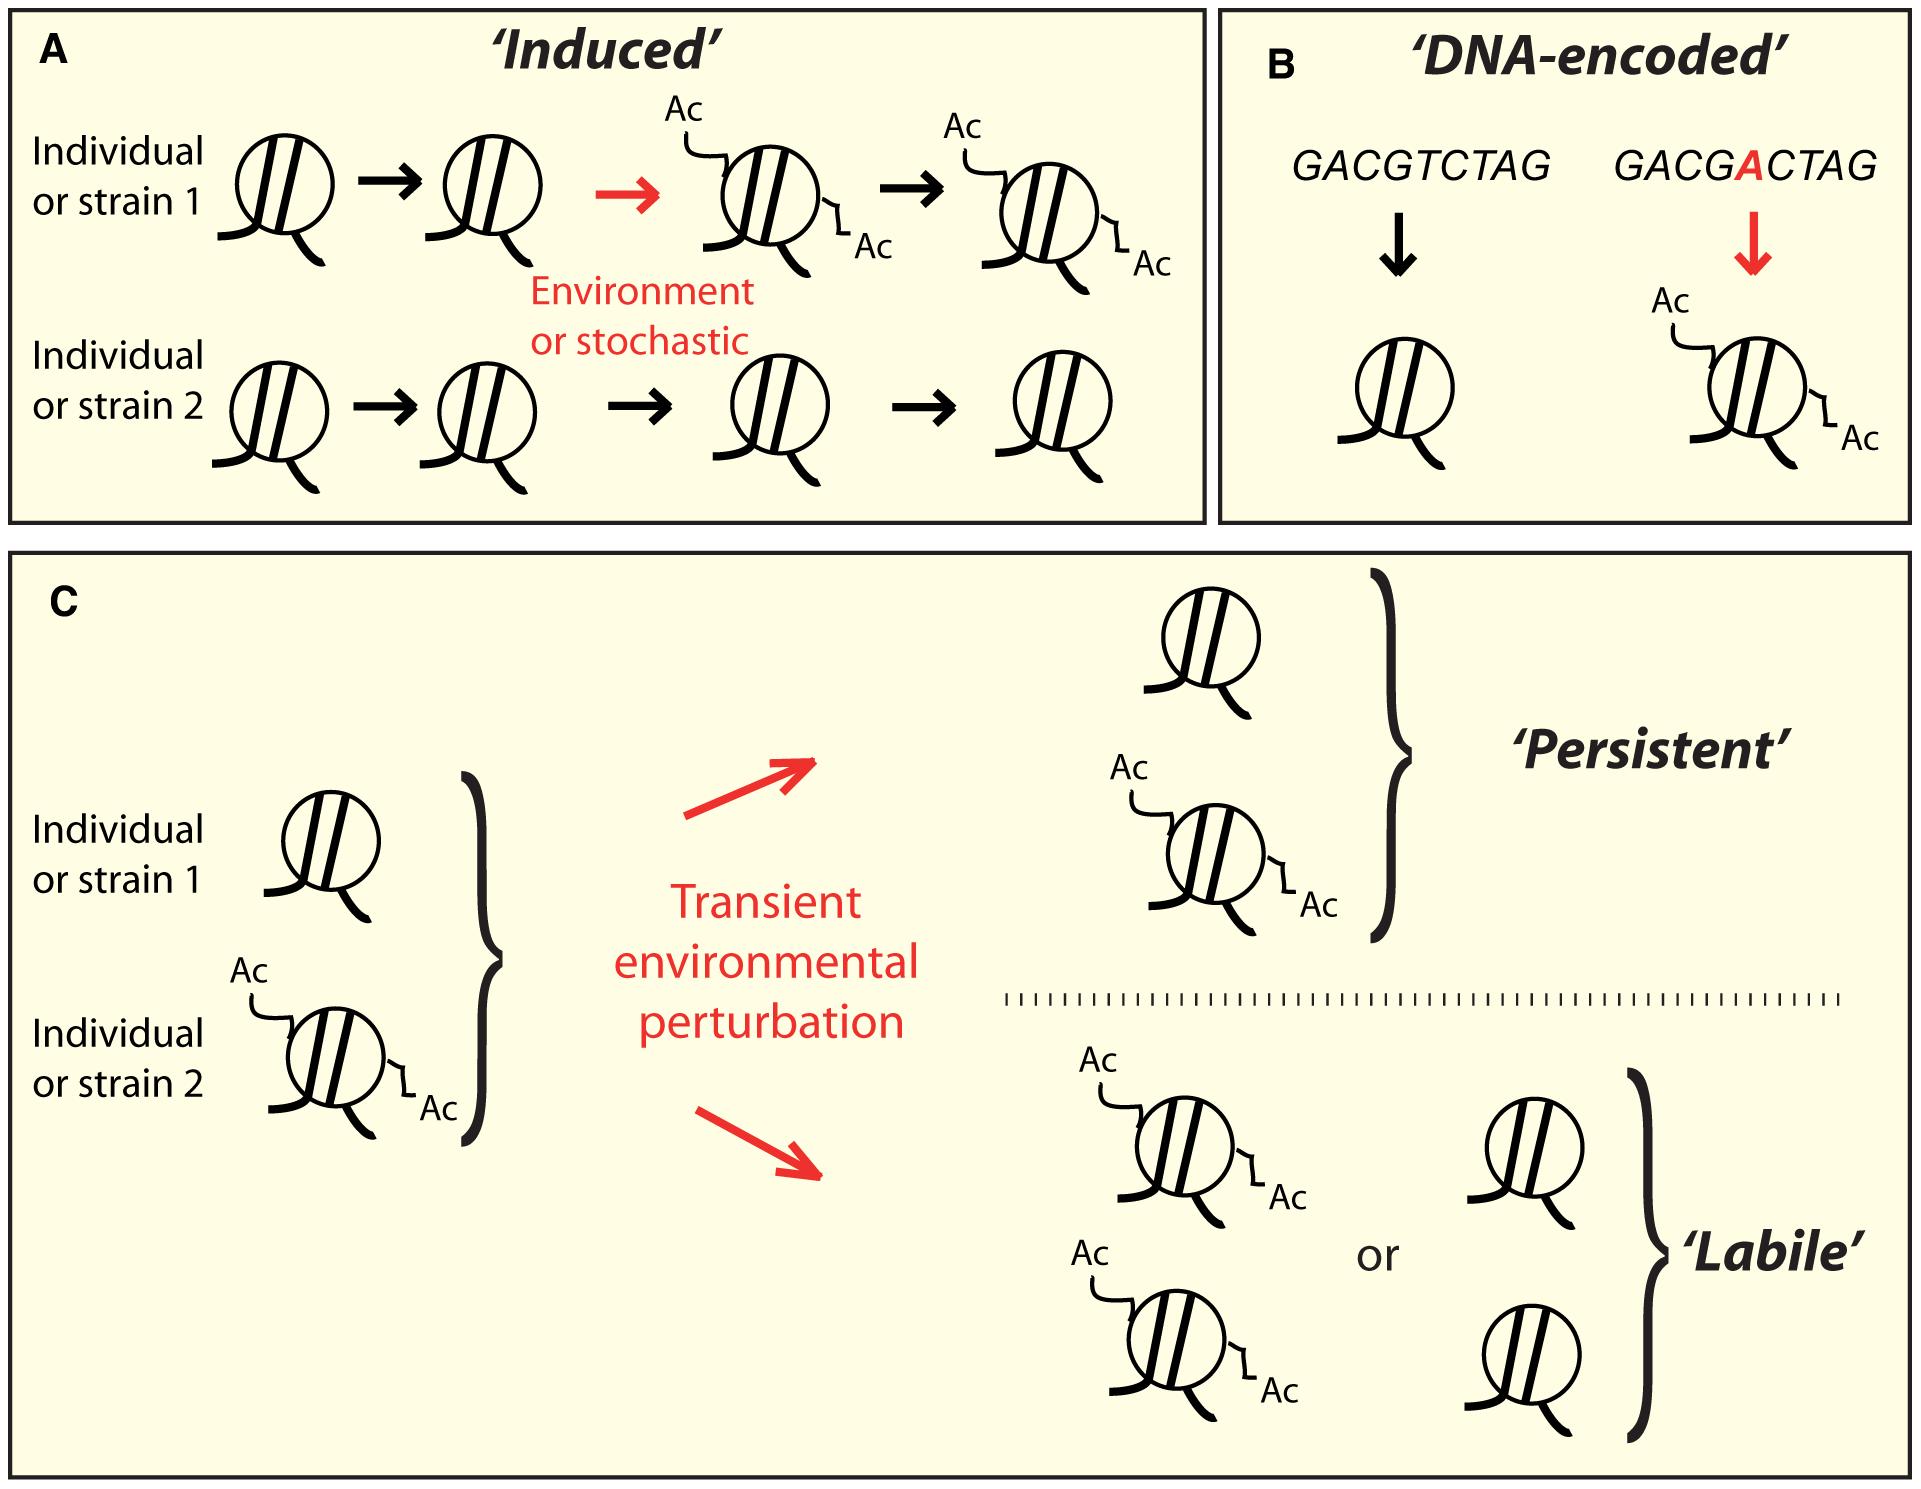 Conceptually distinct classes of epi-polymorphisms.